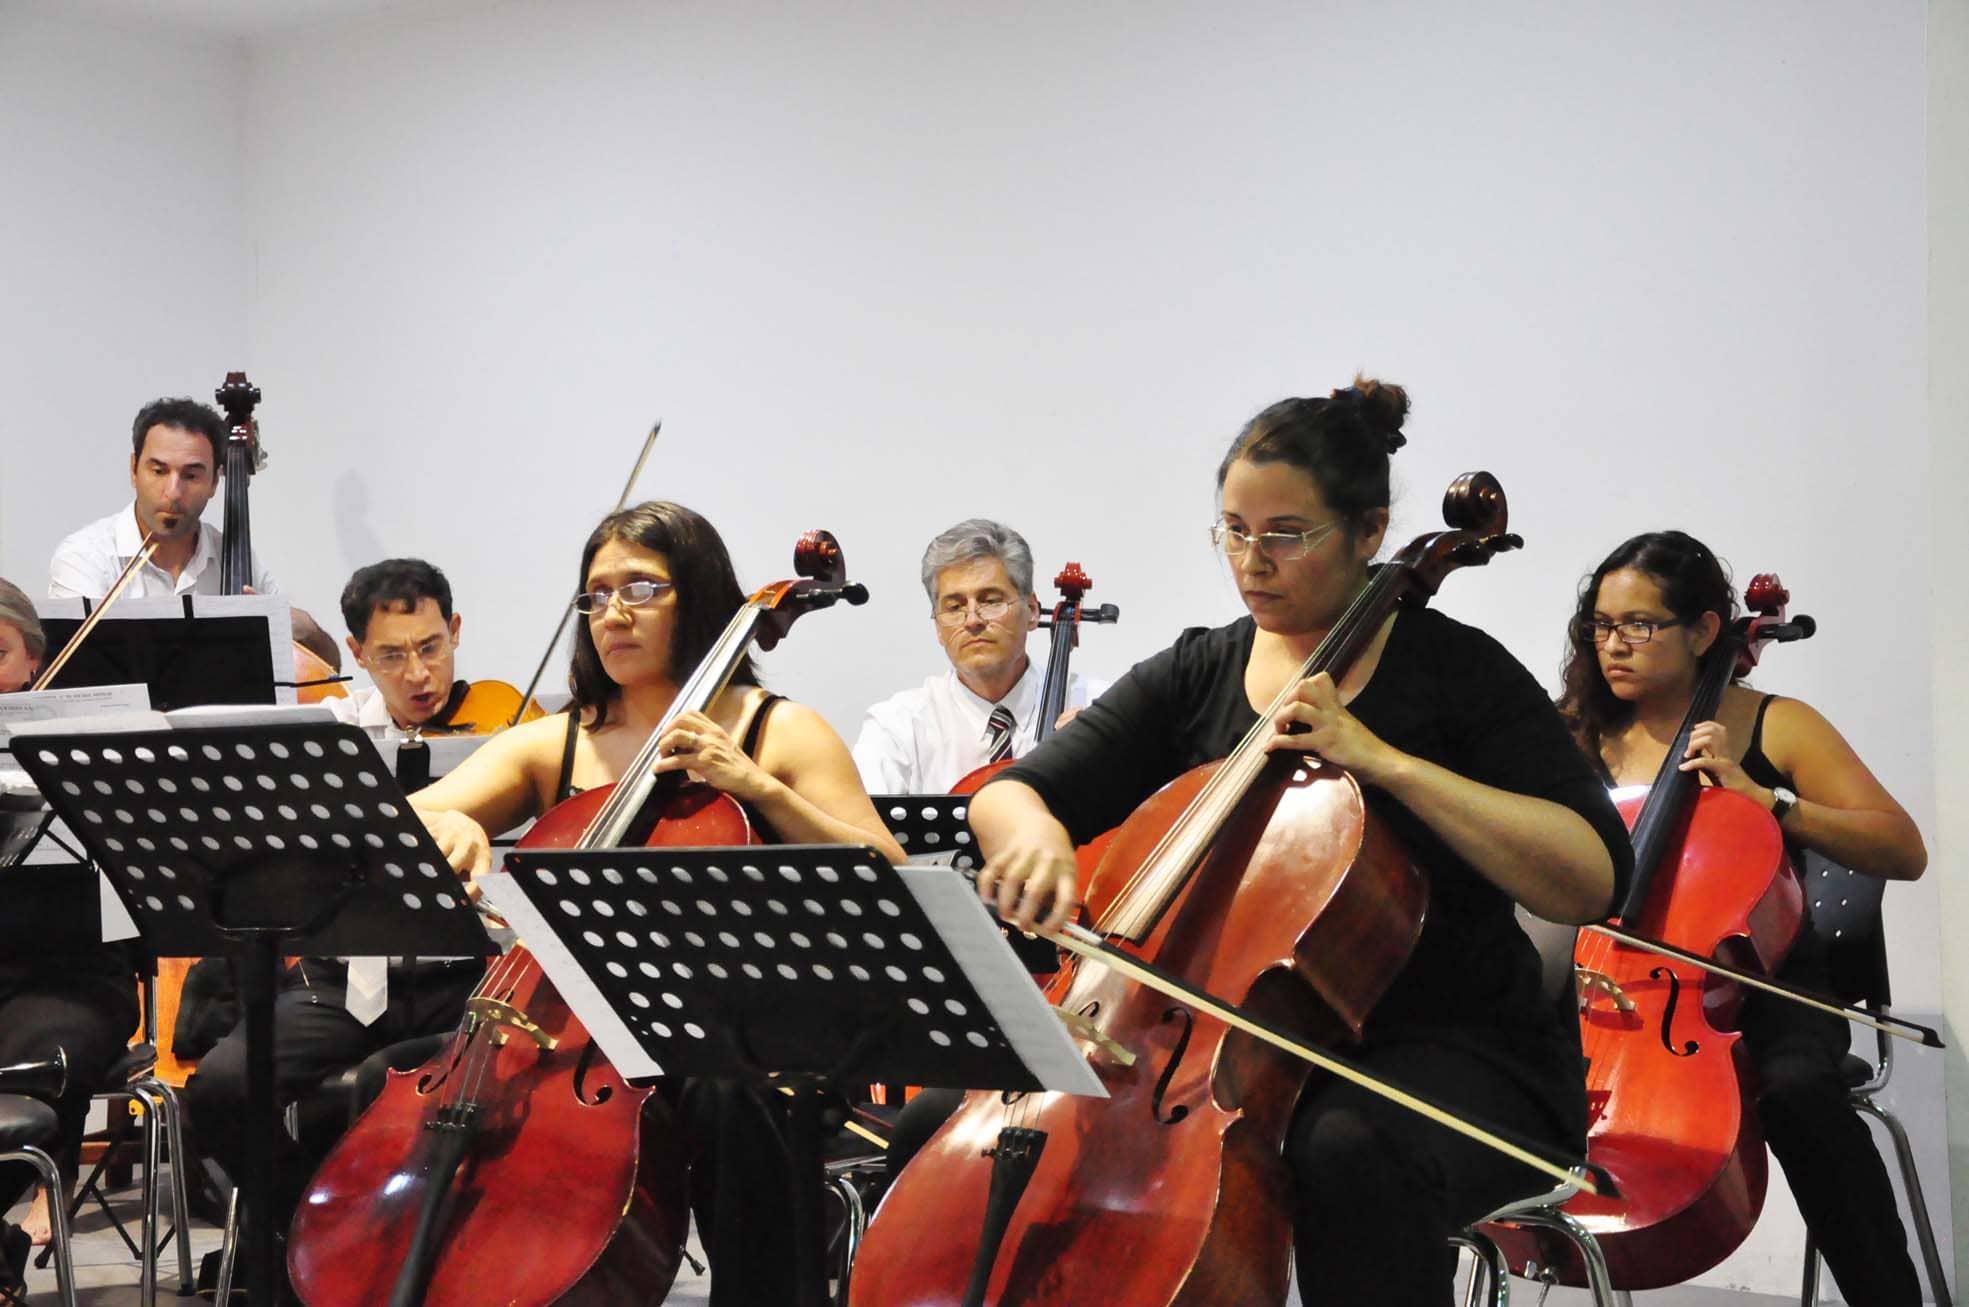 Homenaje a Barracchia escuela de música - enero 2016 (19)